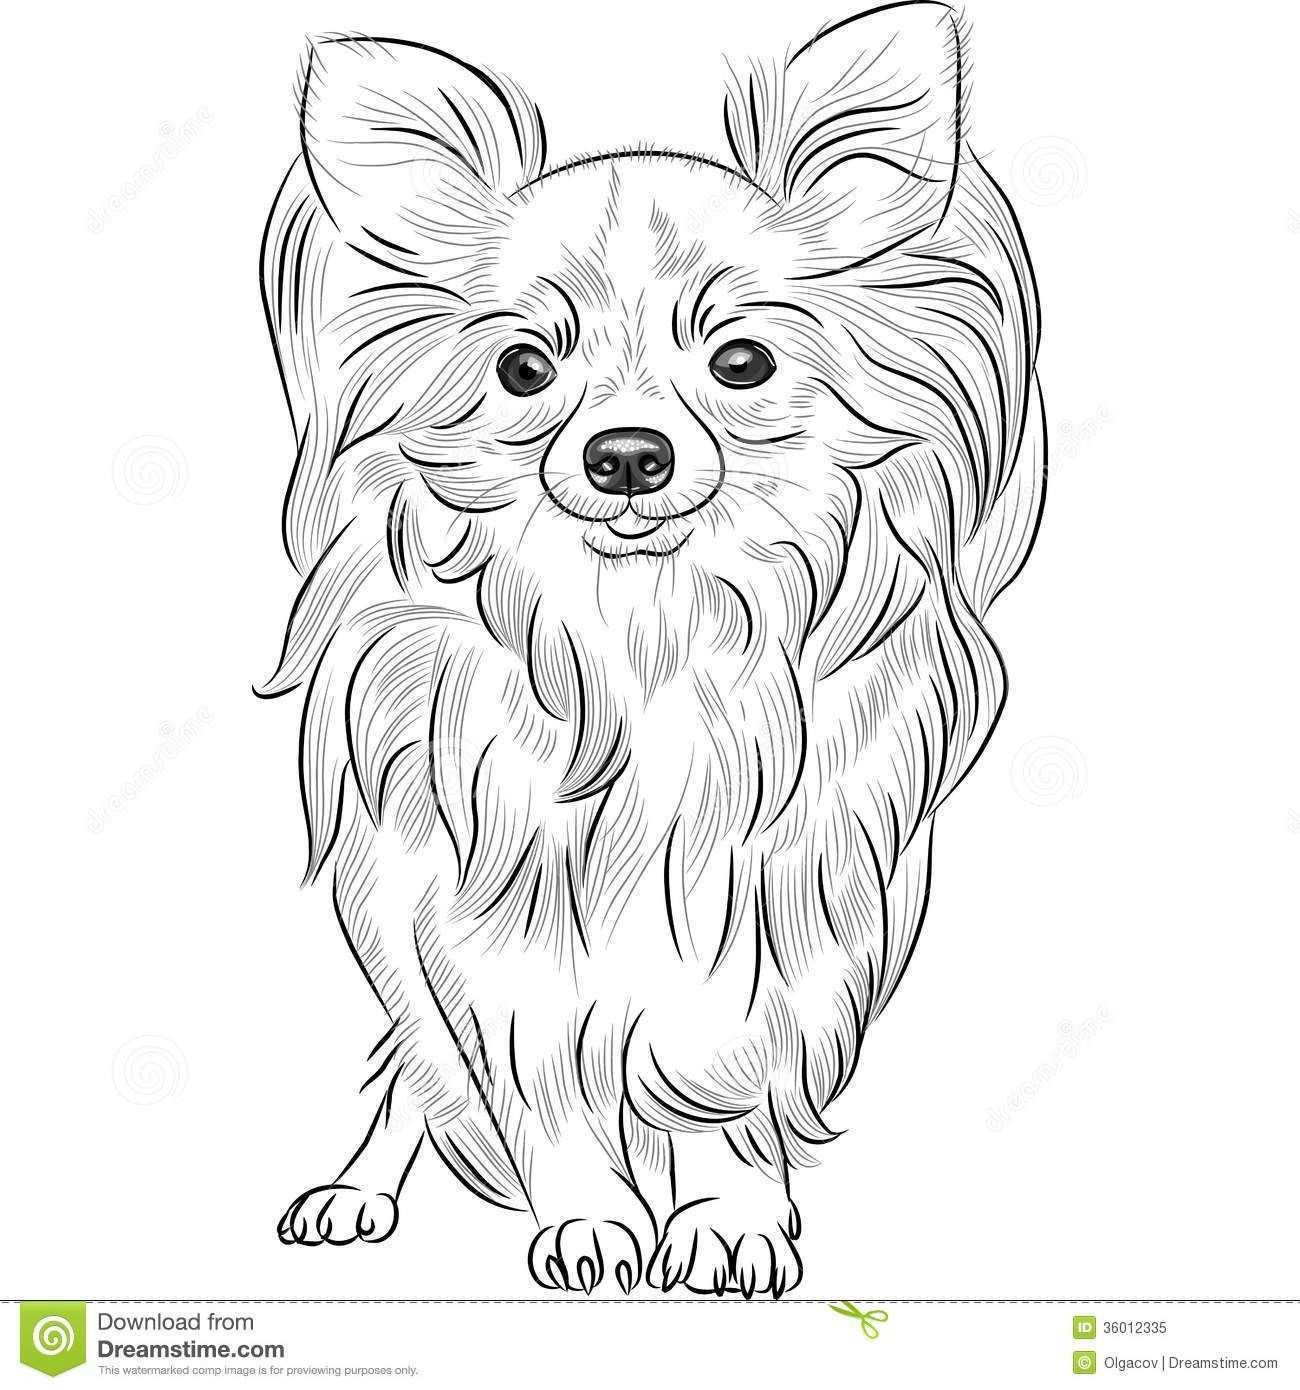 Chihuahua Sketch Google Search Borduren Kruissteek Kruissteek Kleurplaten